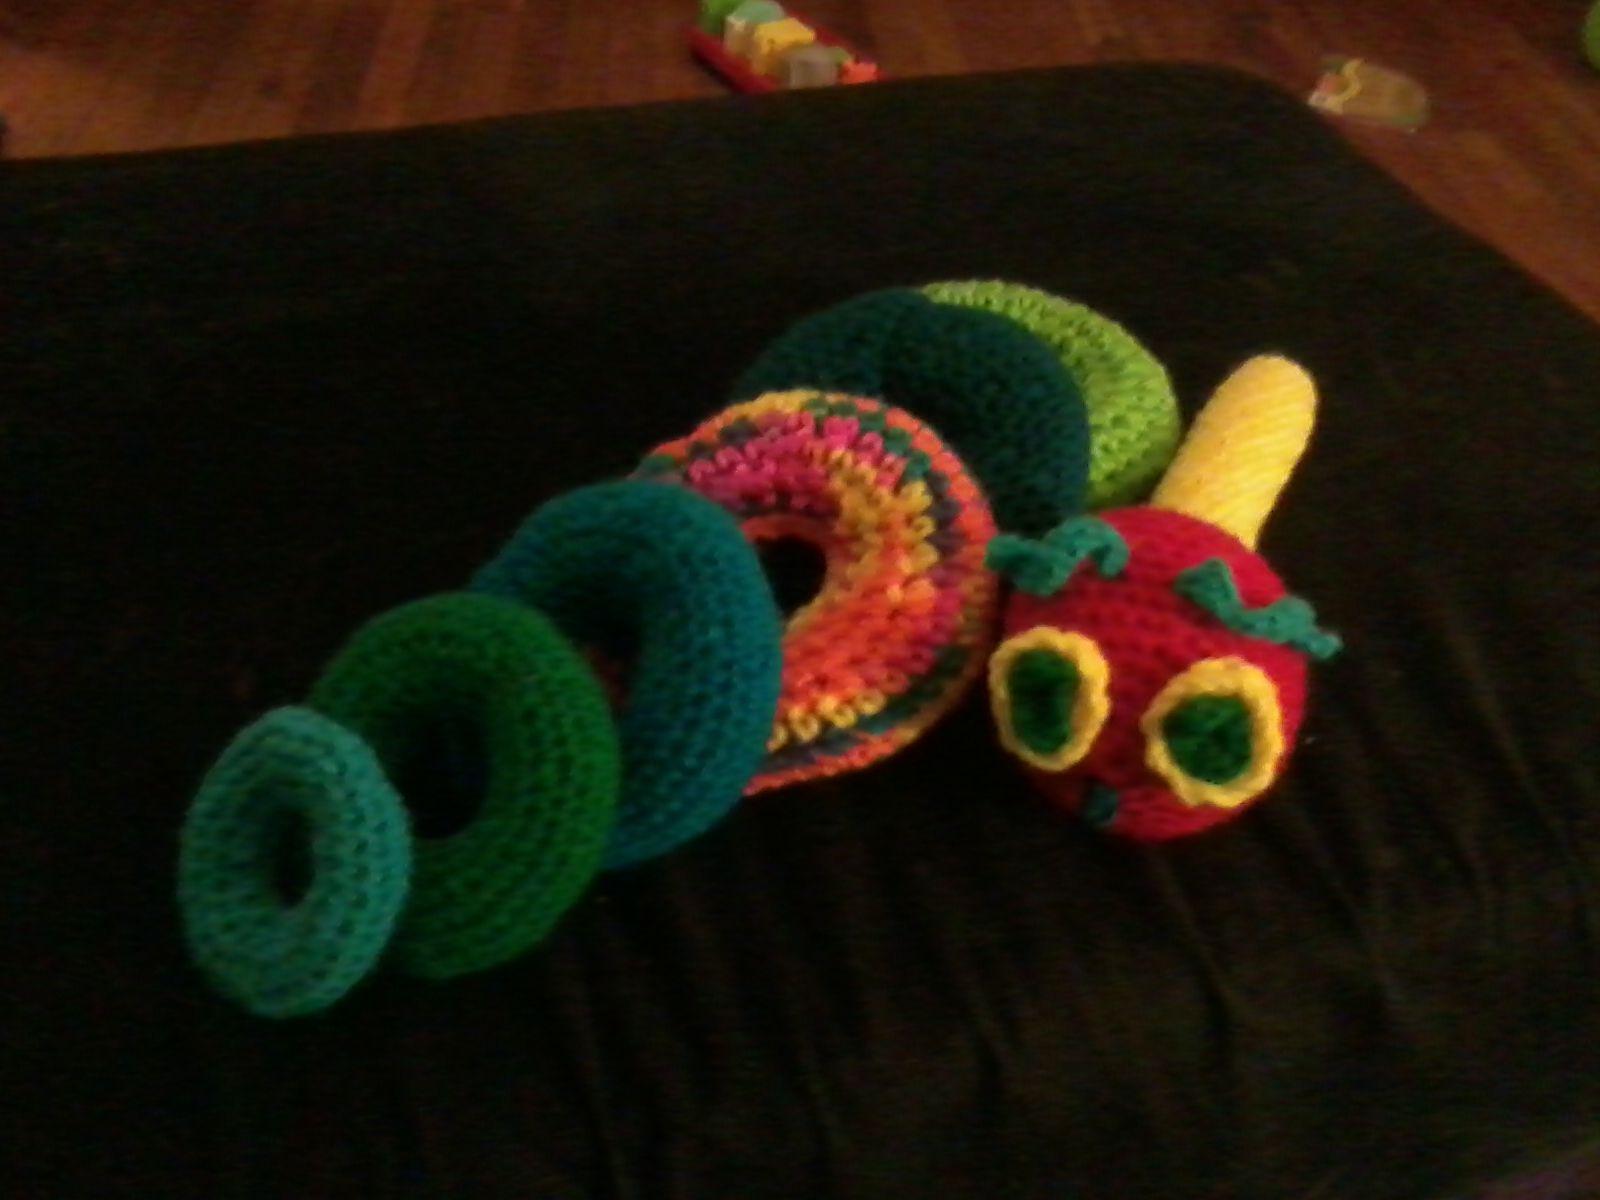 Amigurumi Caterpillar : Very hungry caterpillar stacking toy that i made #amigurumi